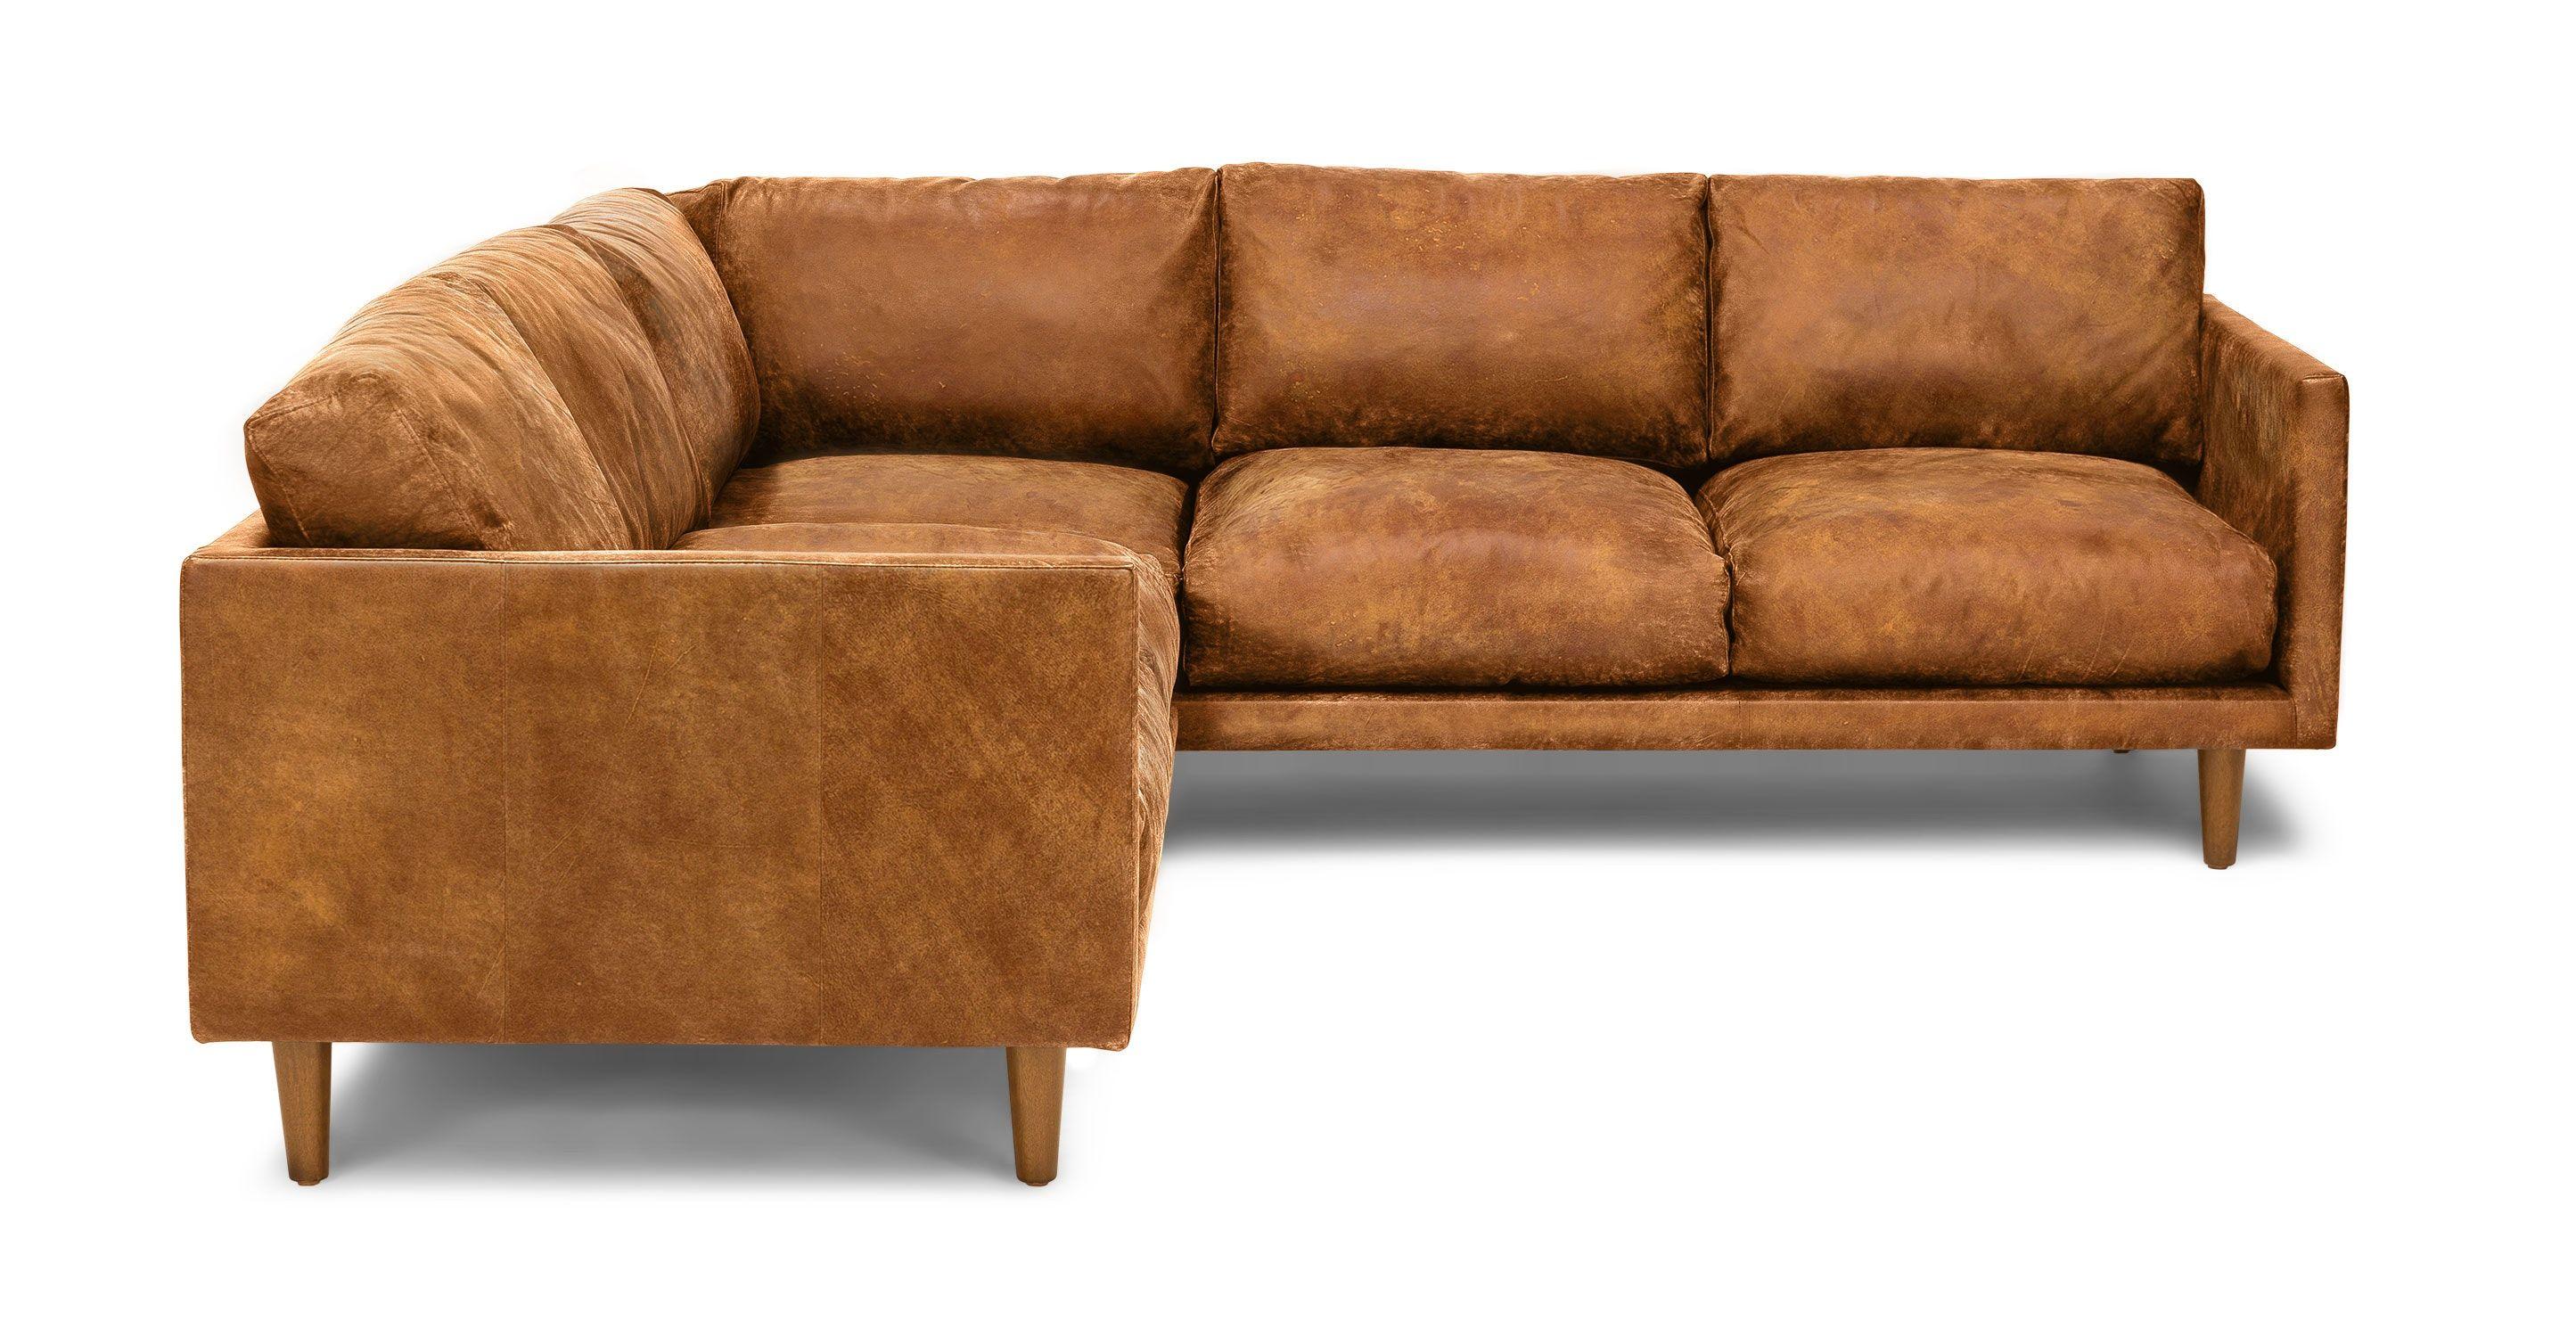 Best Nirvana Dakota Tan Corner Sectional Sectional Sofa Decor 400 x 300